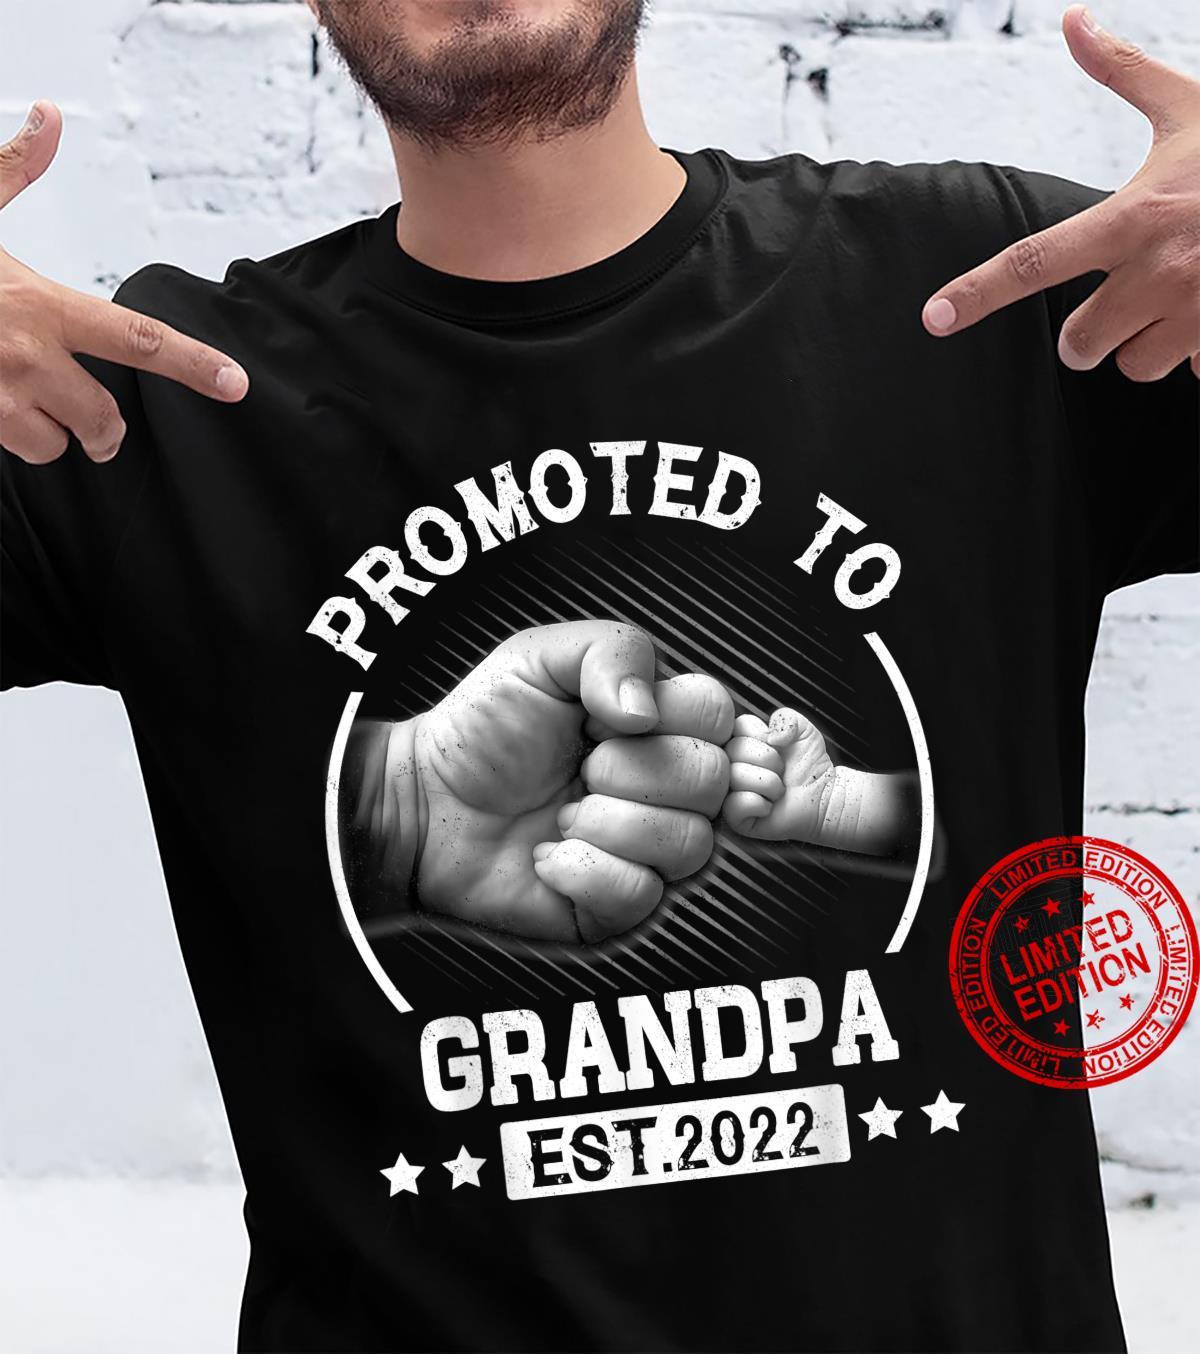 Promoted to Grandpa EST 2022 Vintage New Grandpa Shirt